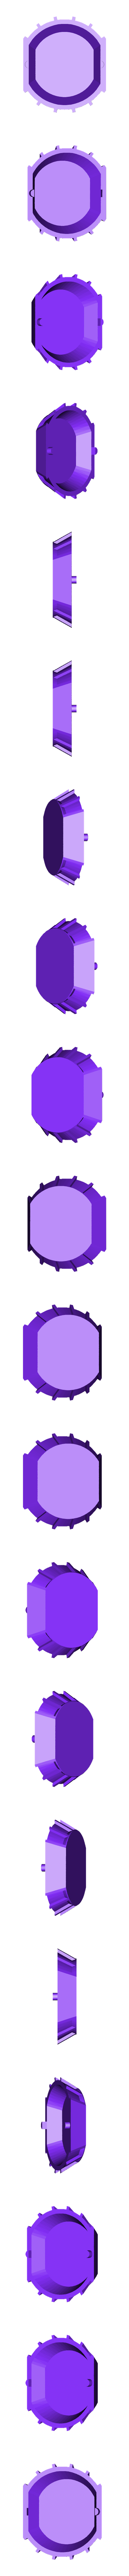 Bottom Cover.STL Download STL file Droid Echo Dot (4th Gen) Holder • 3D printing object, biglildesign